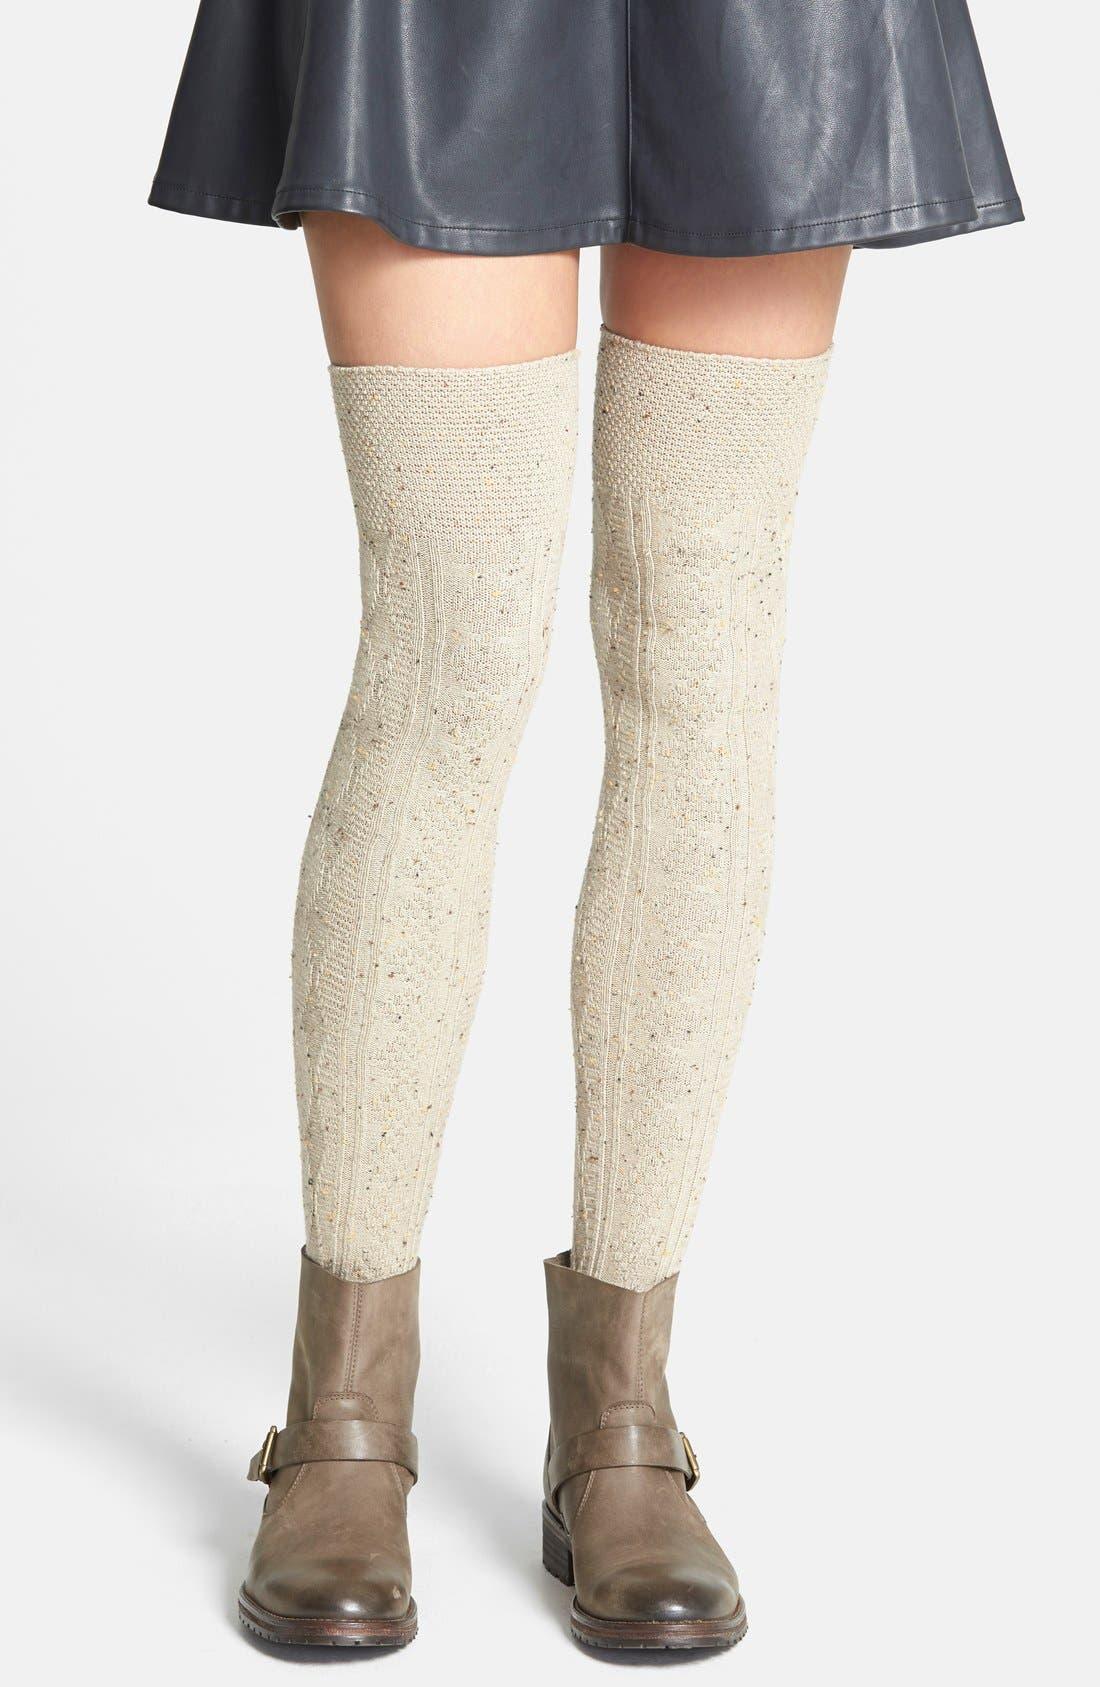 Main Image - Nordstrom 'Confetti' Over The Knee Socks